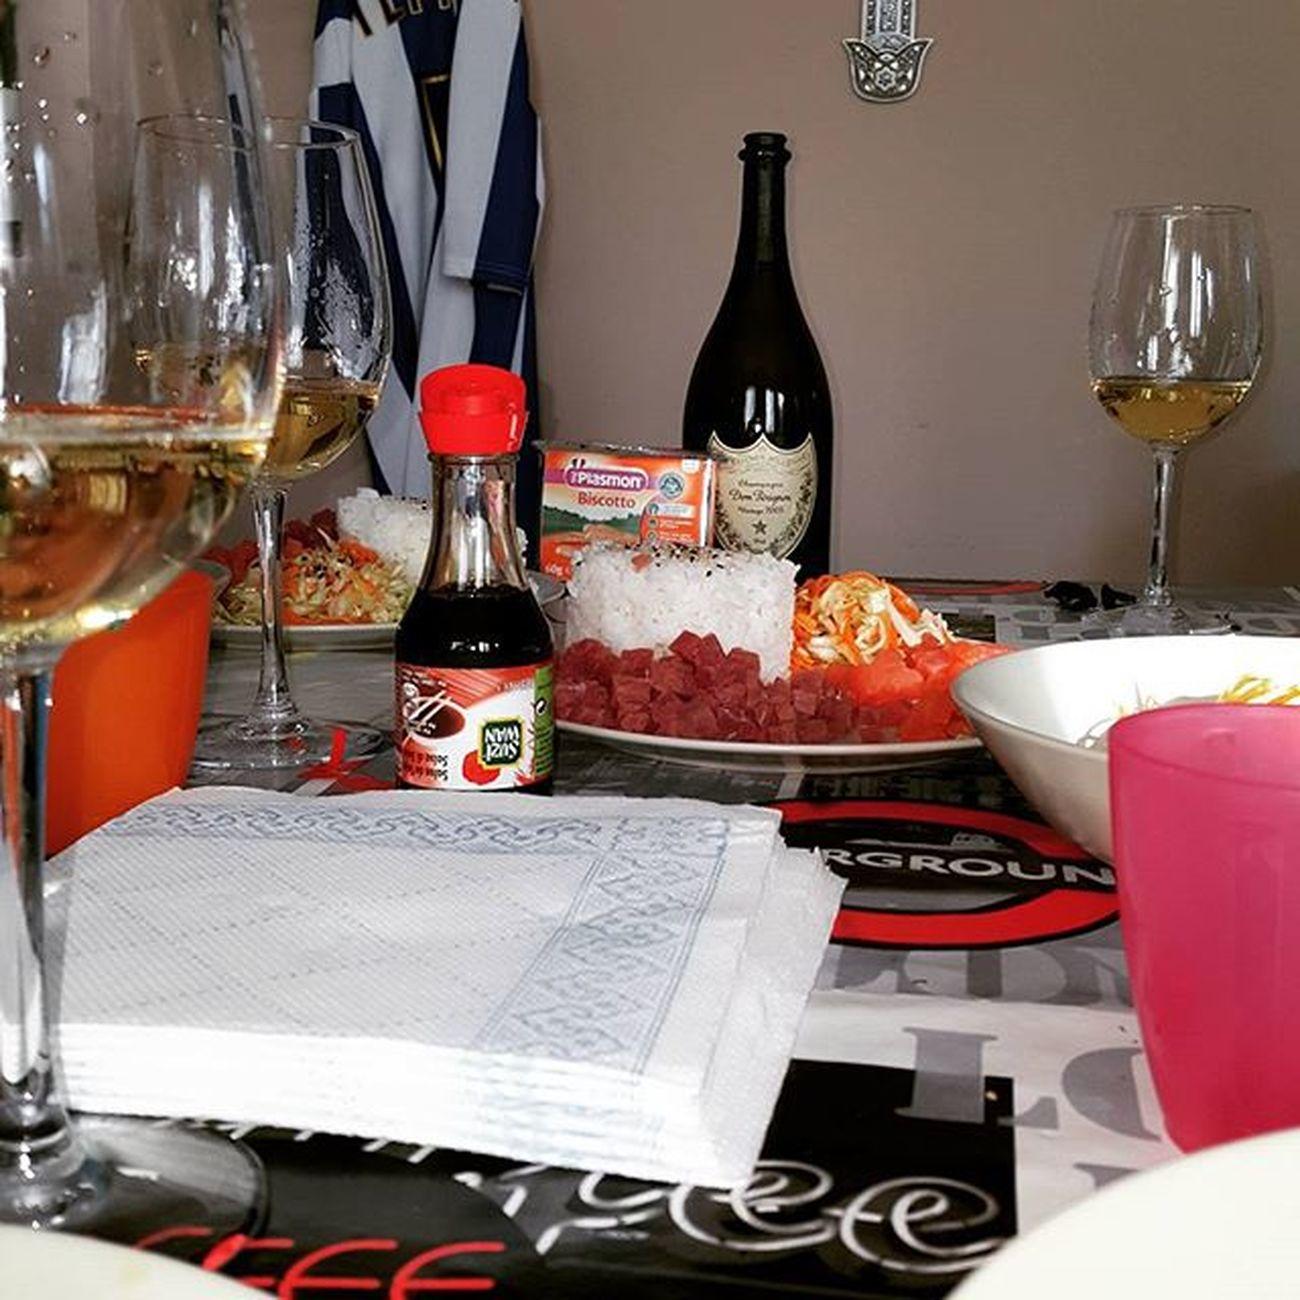 Donperignon sushi & Plasmon Farepietaalcazzo